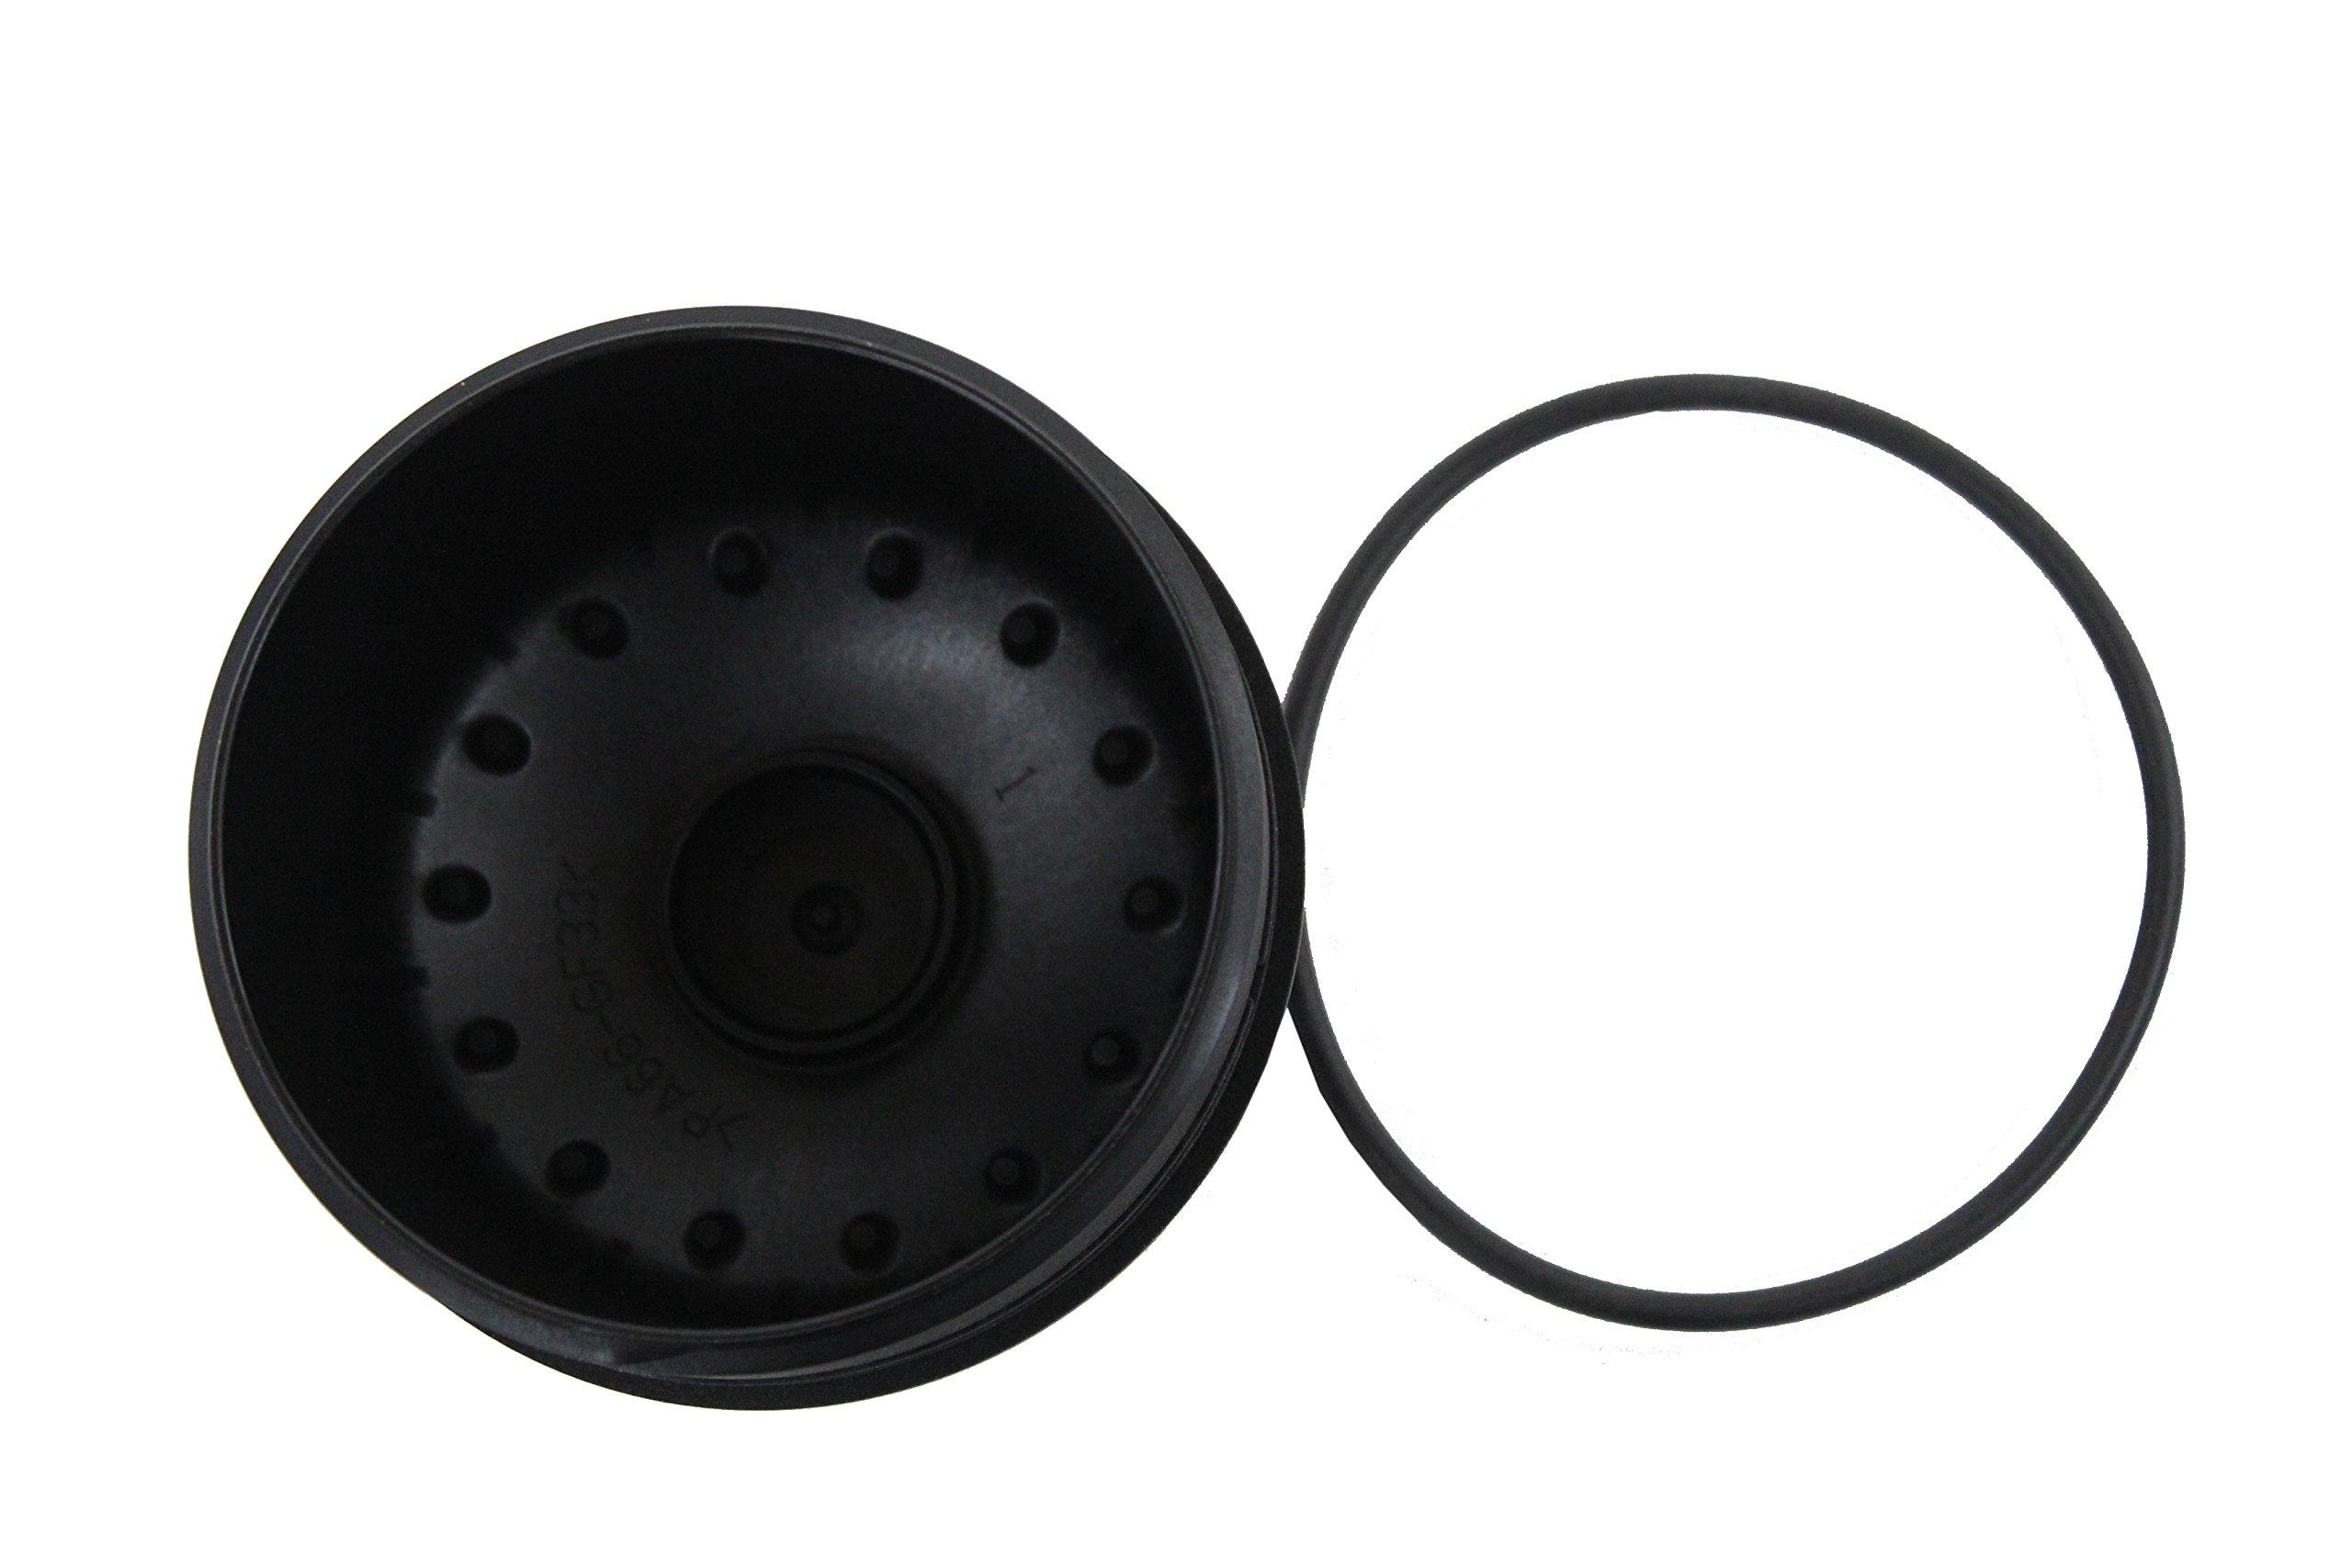 Genuine Ford 3C3Z-6766-CA Oil Filler Cap Assembly